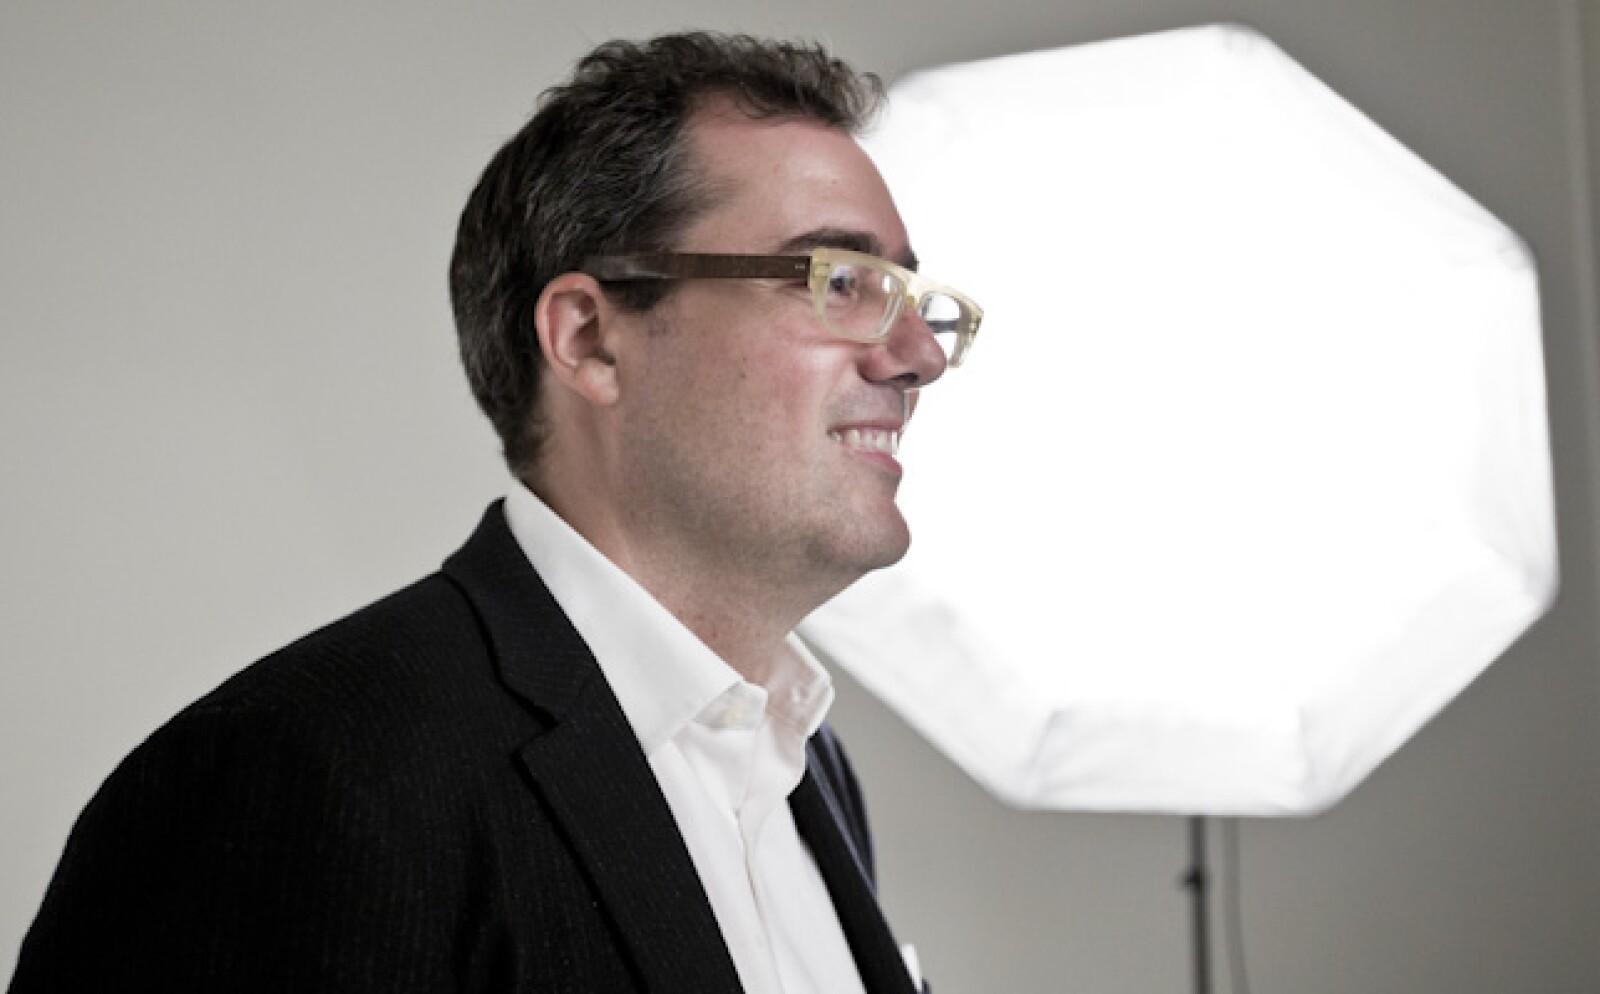 Iván Saldaña, productor y comercializador de mezcal, participa en Emprendedores 2014 con su empresa Casa Montelobos.